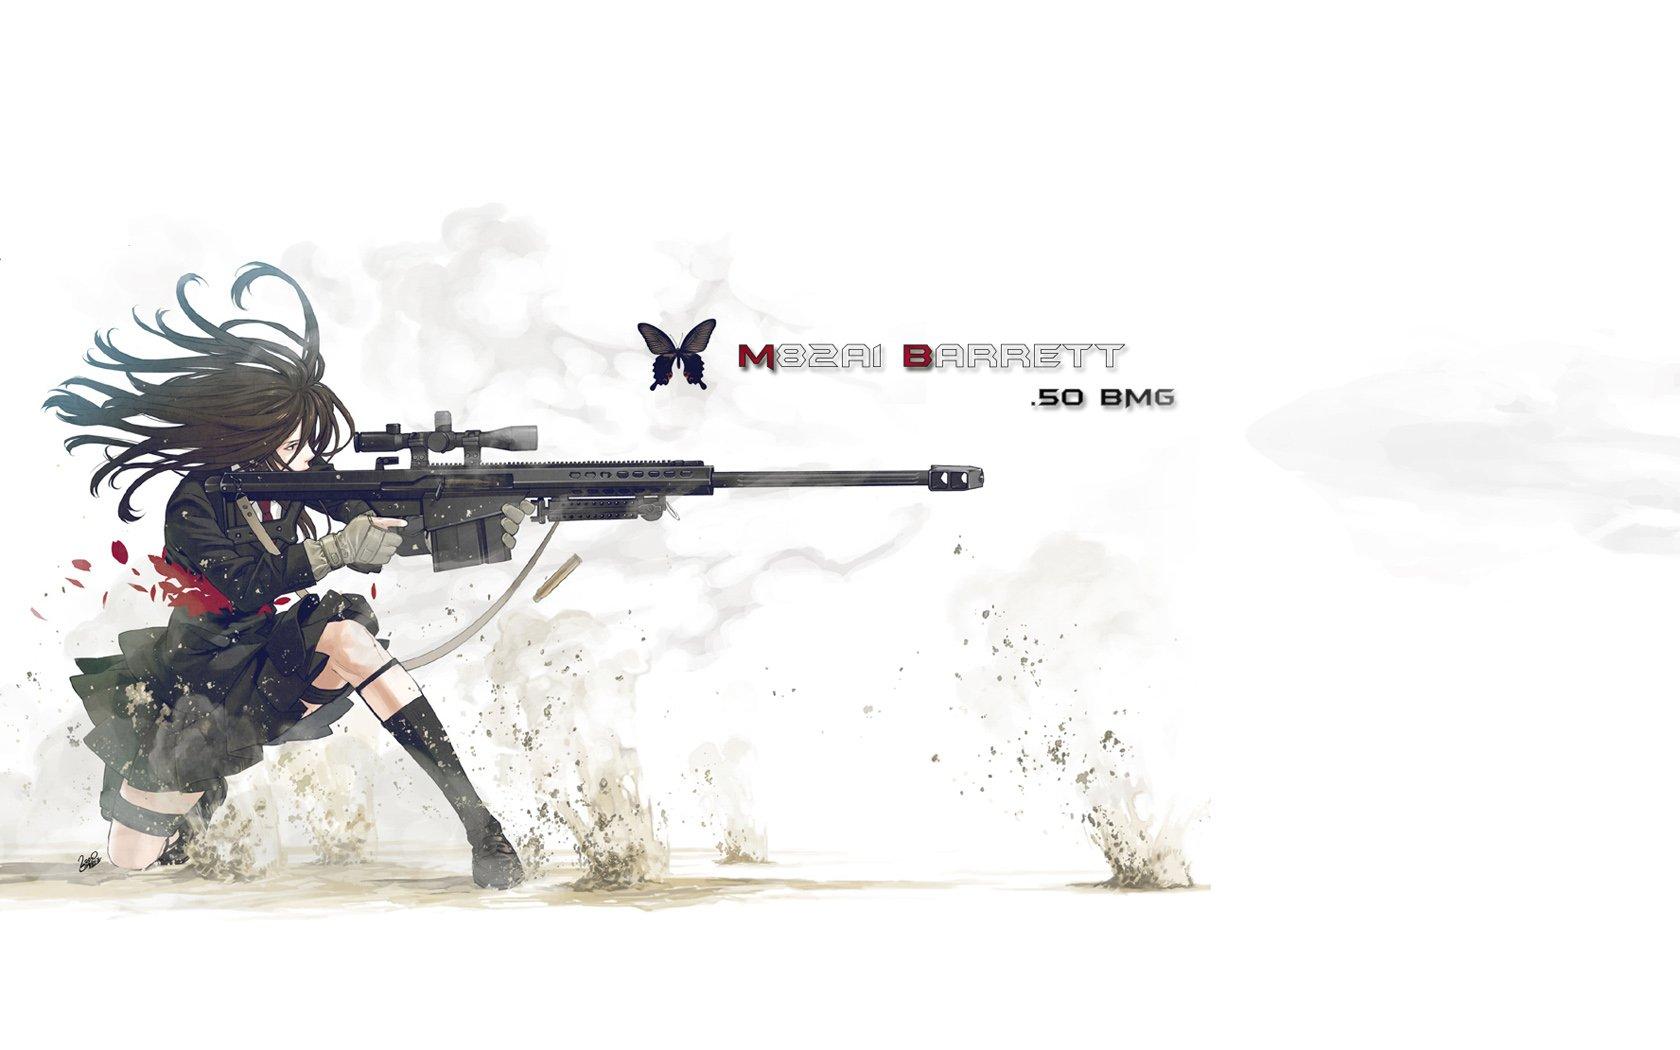 Anime - Urbild  Sniper Anime Flicka Original (Anime) Bakgrund